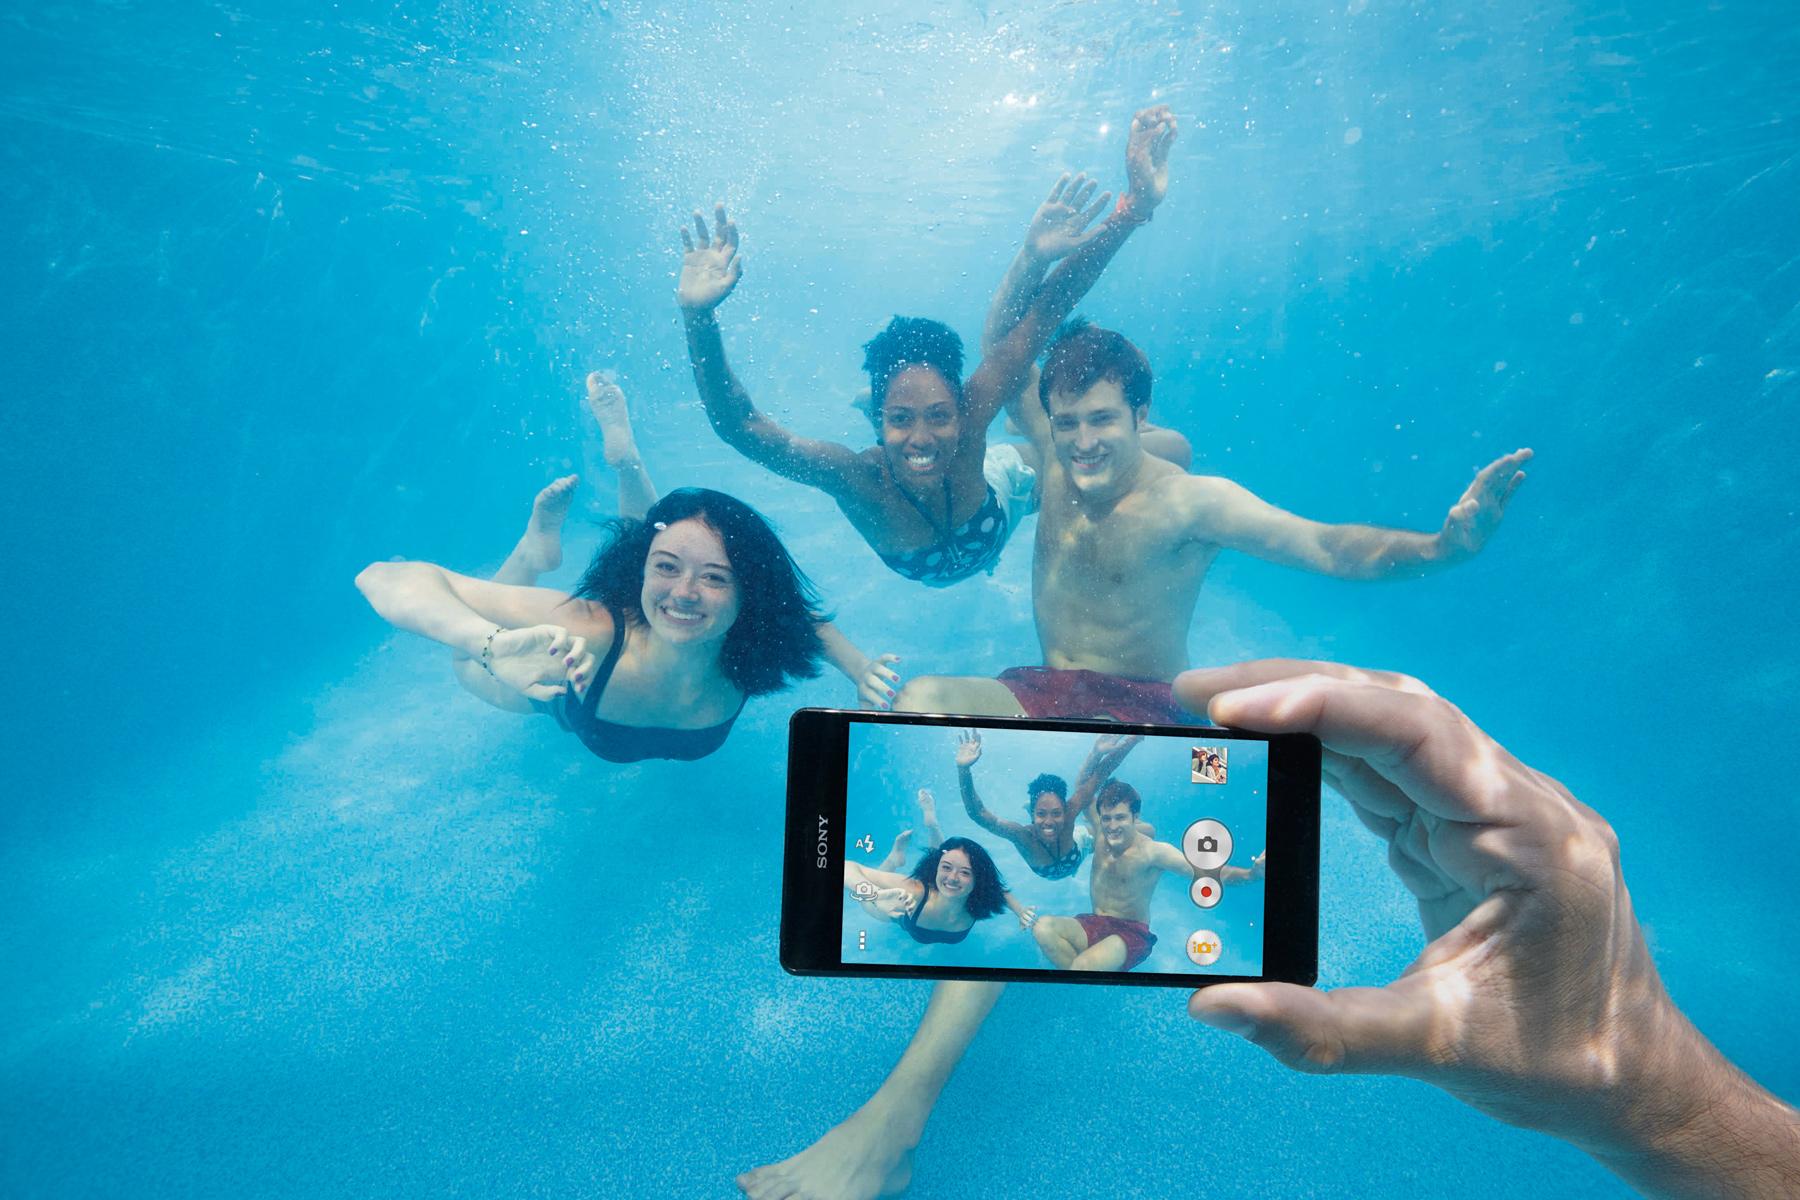 Don't use Sony smartphones underwater